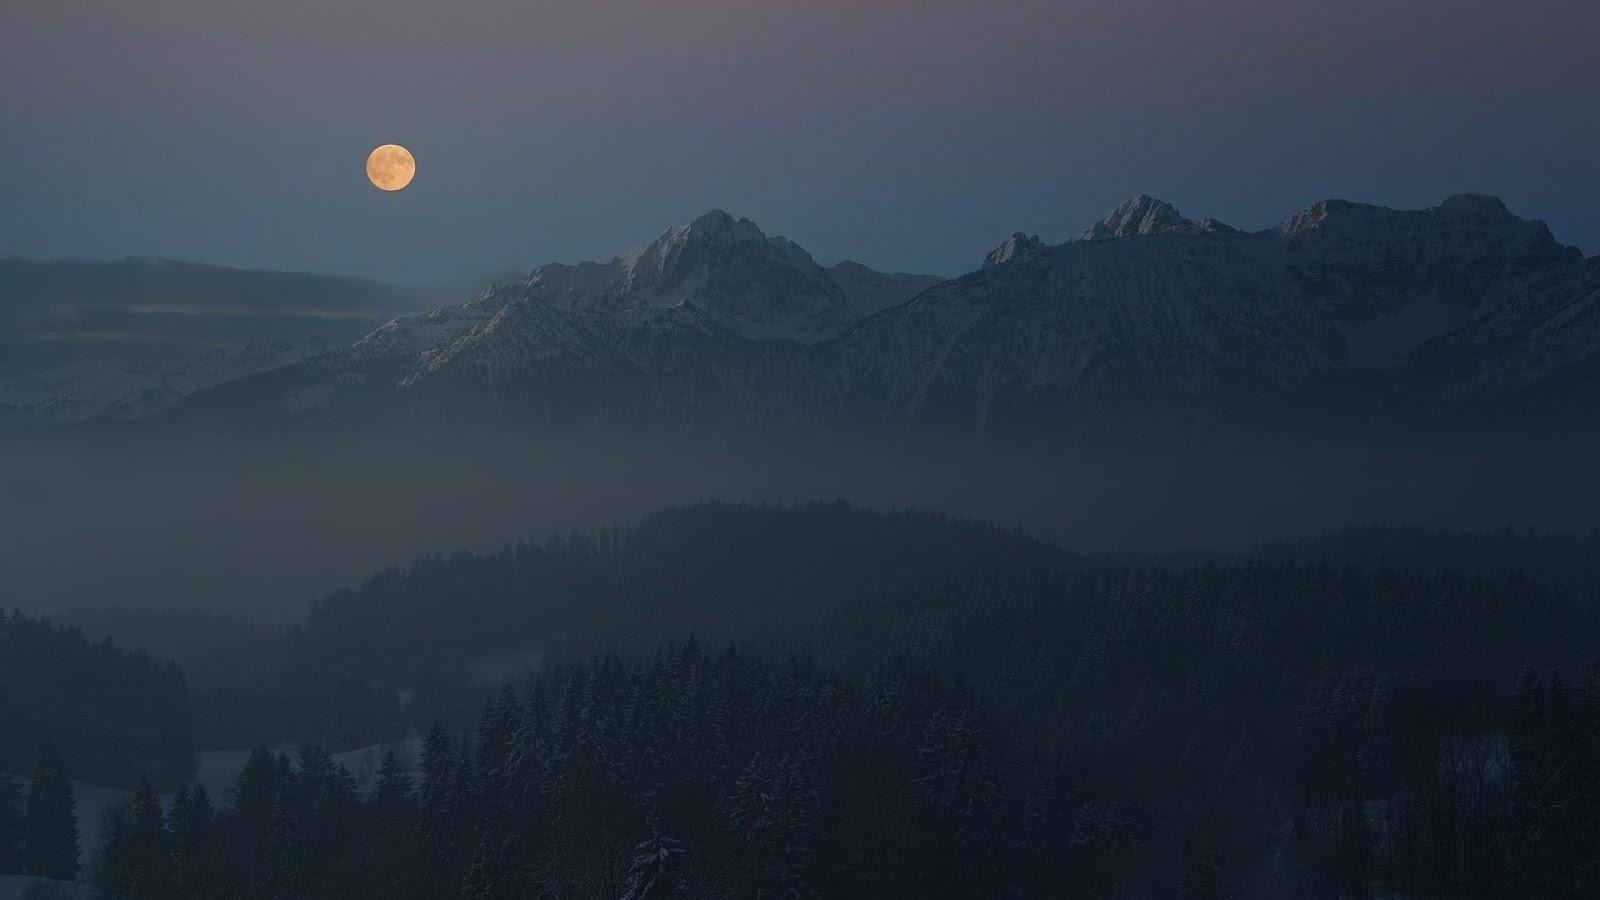 large mountain range with yellow moon